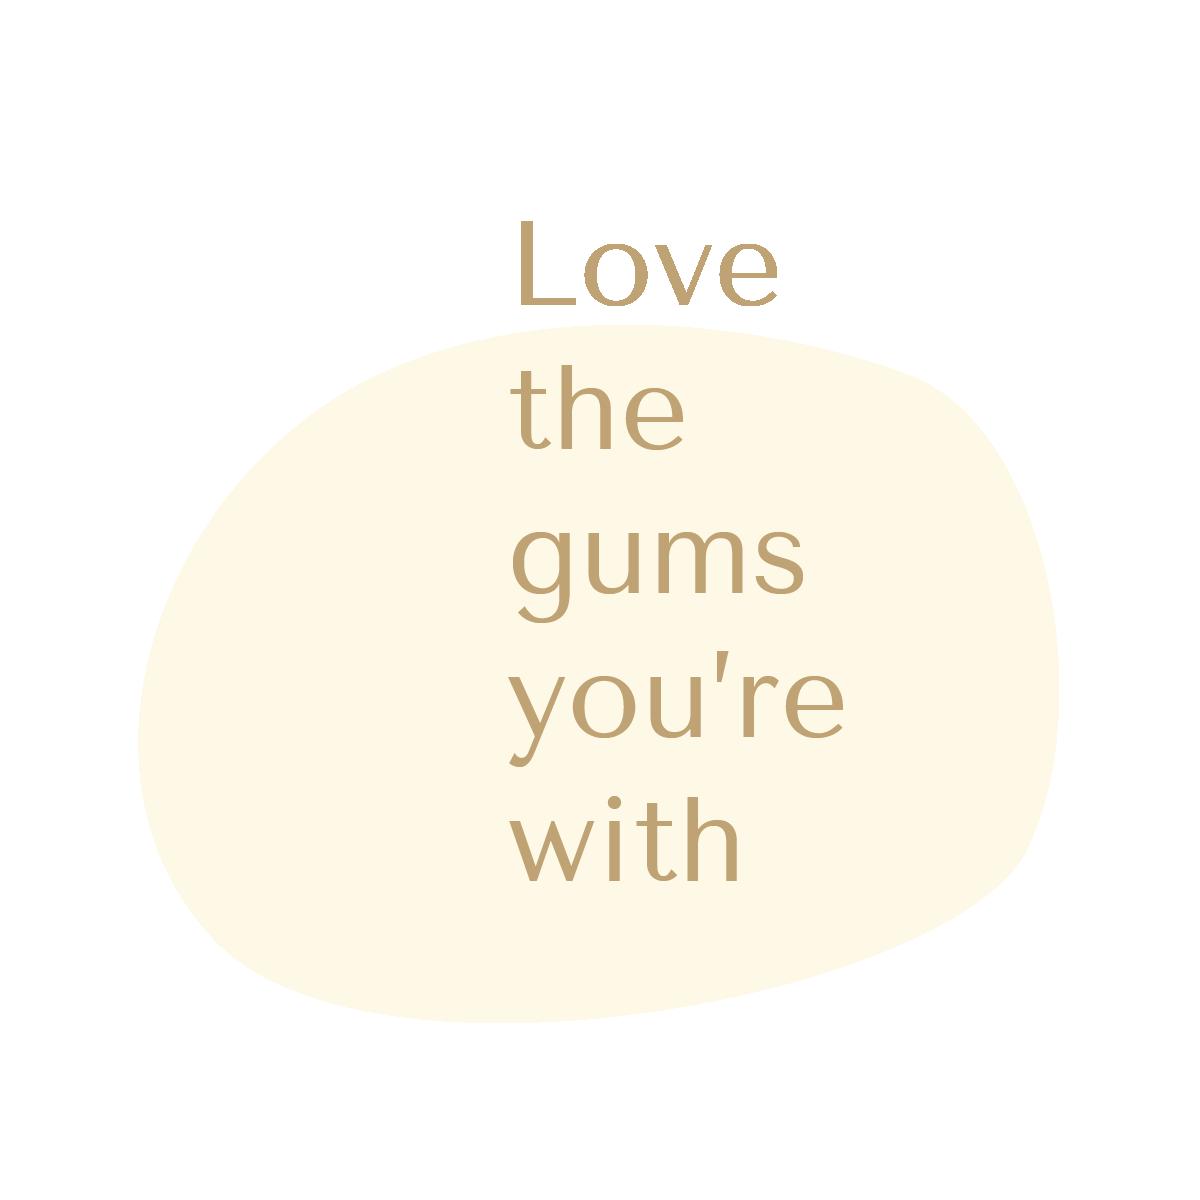 surry hills dental gum health quote